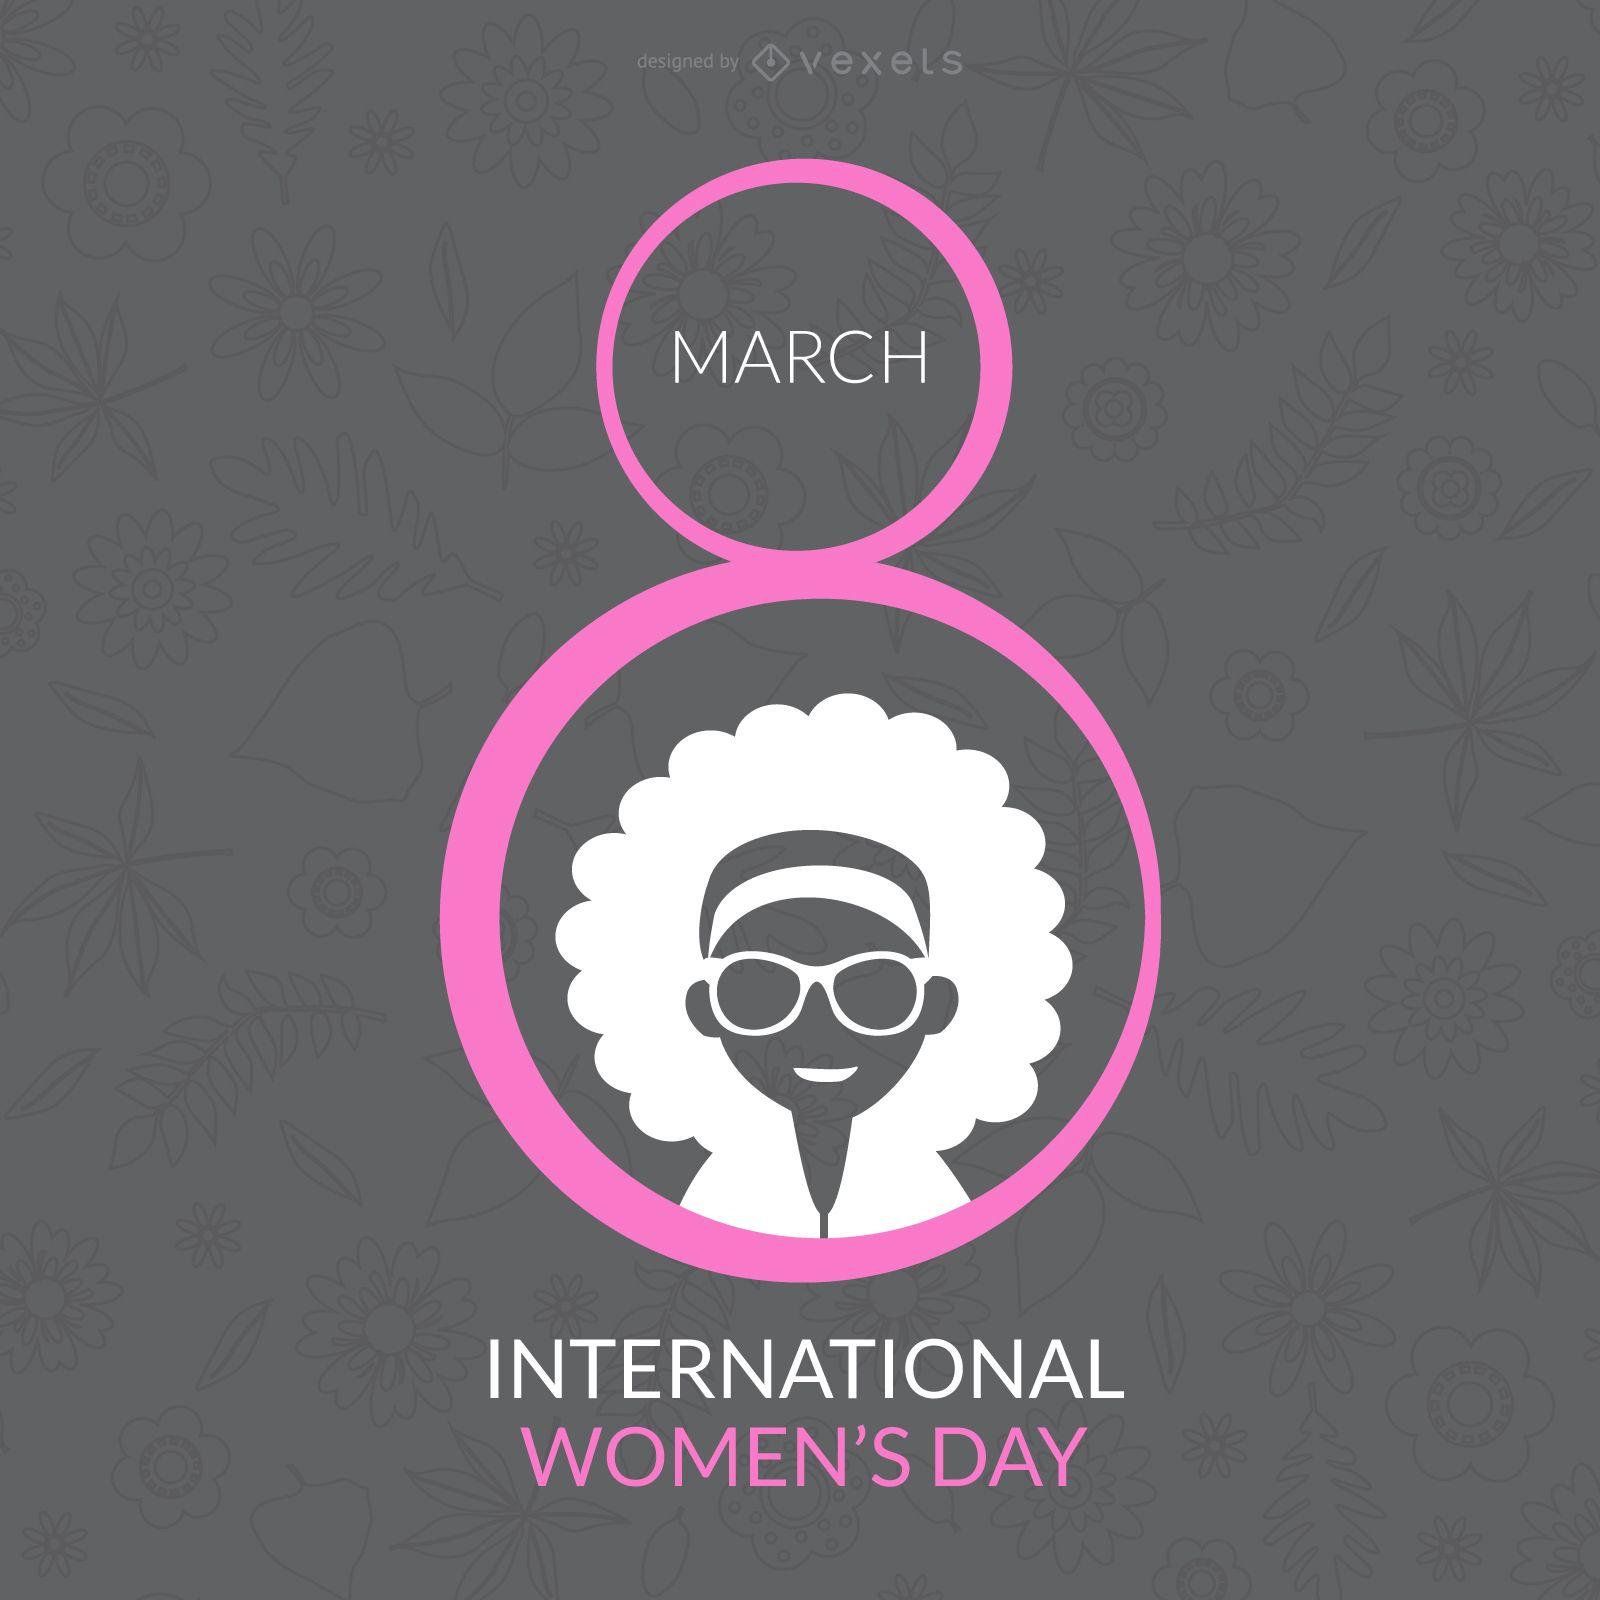 International Women's Day desgin